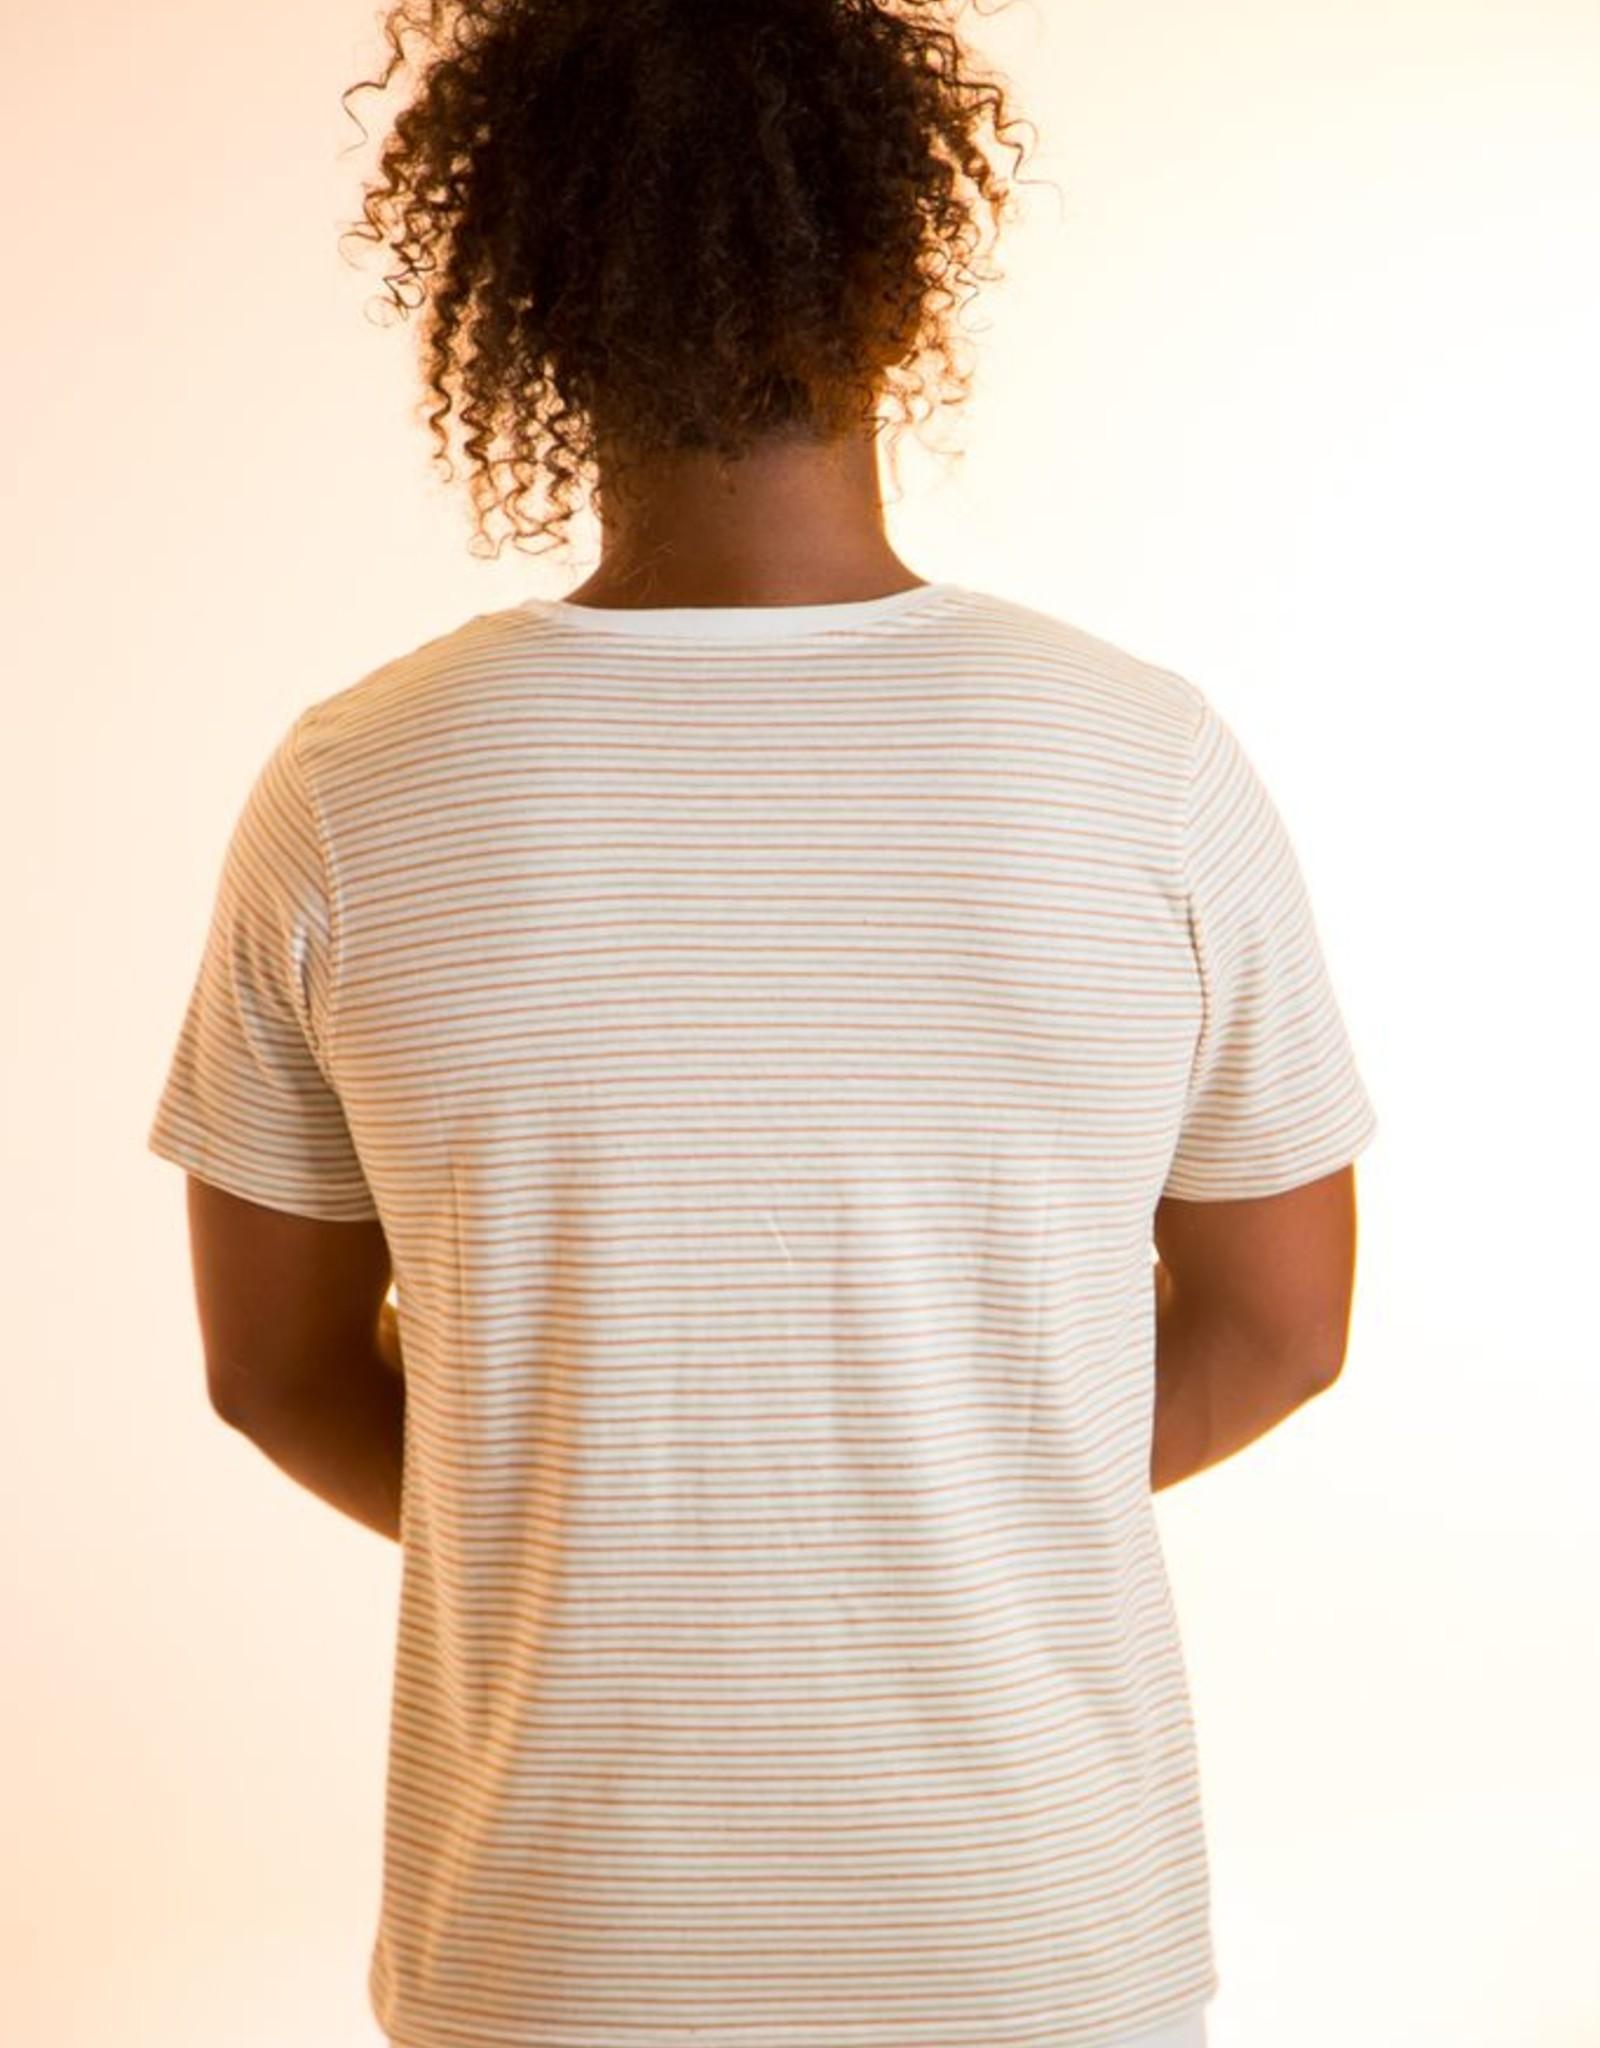 Camiseta hombre listada de manga corta.